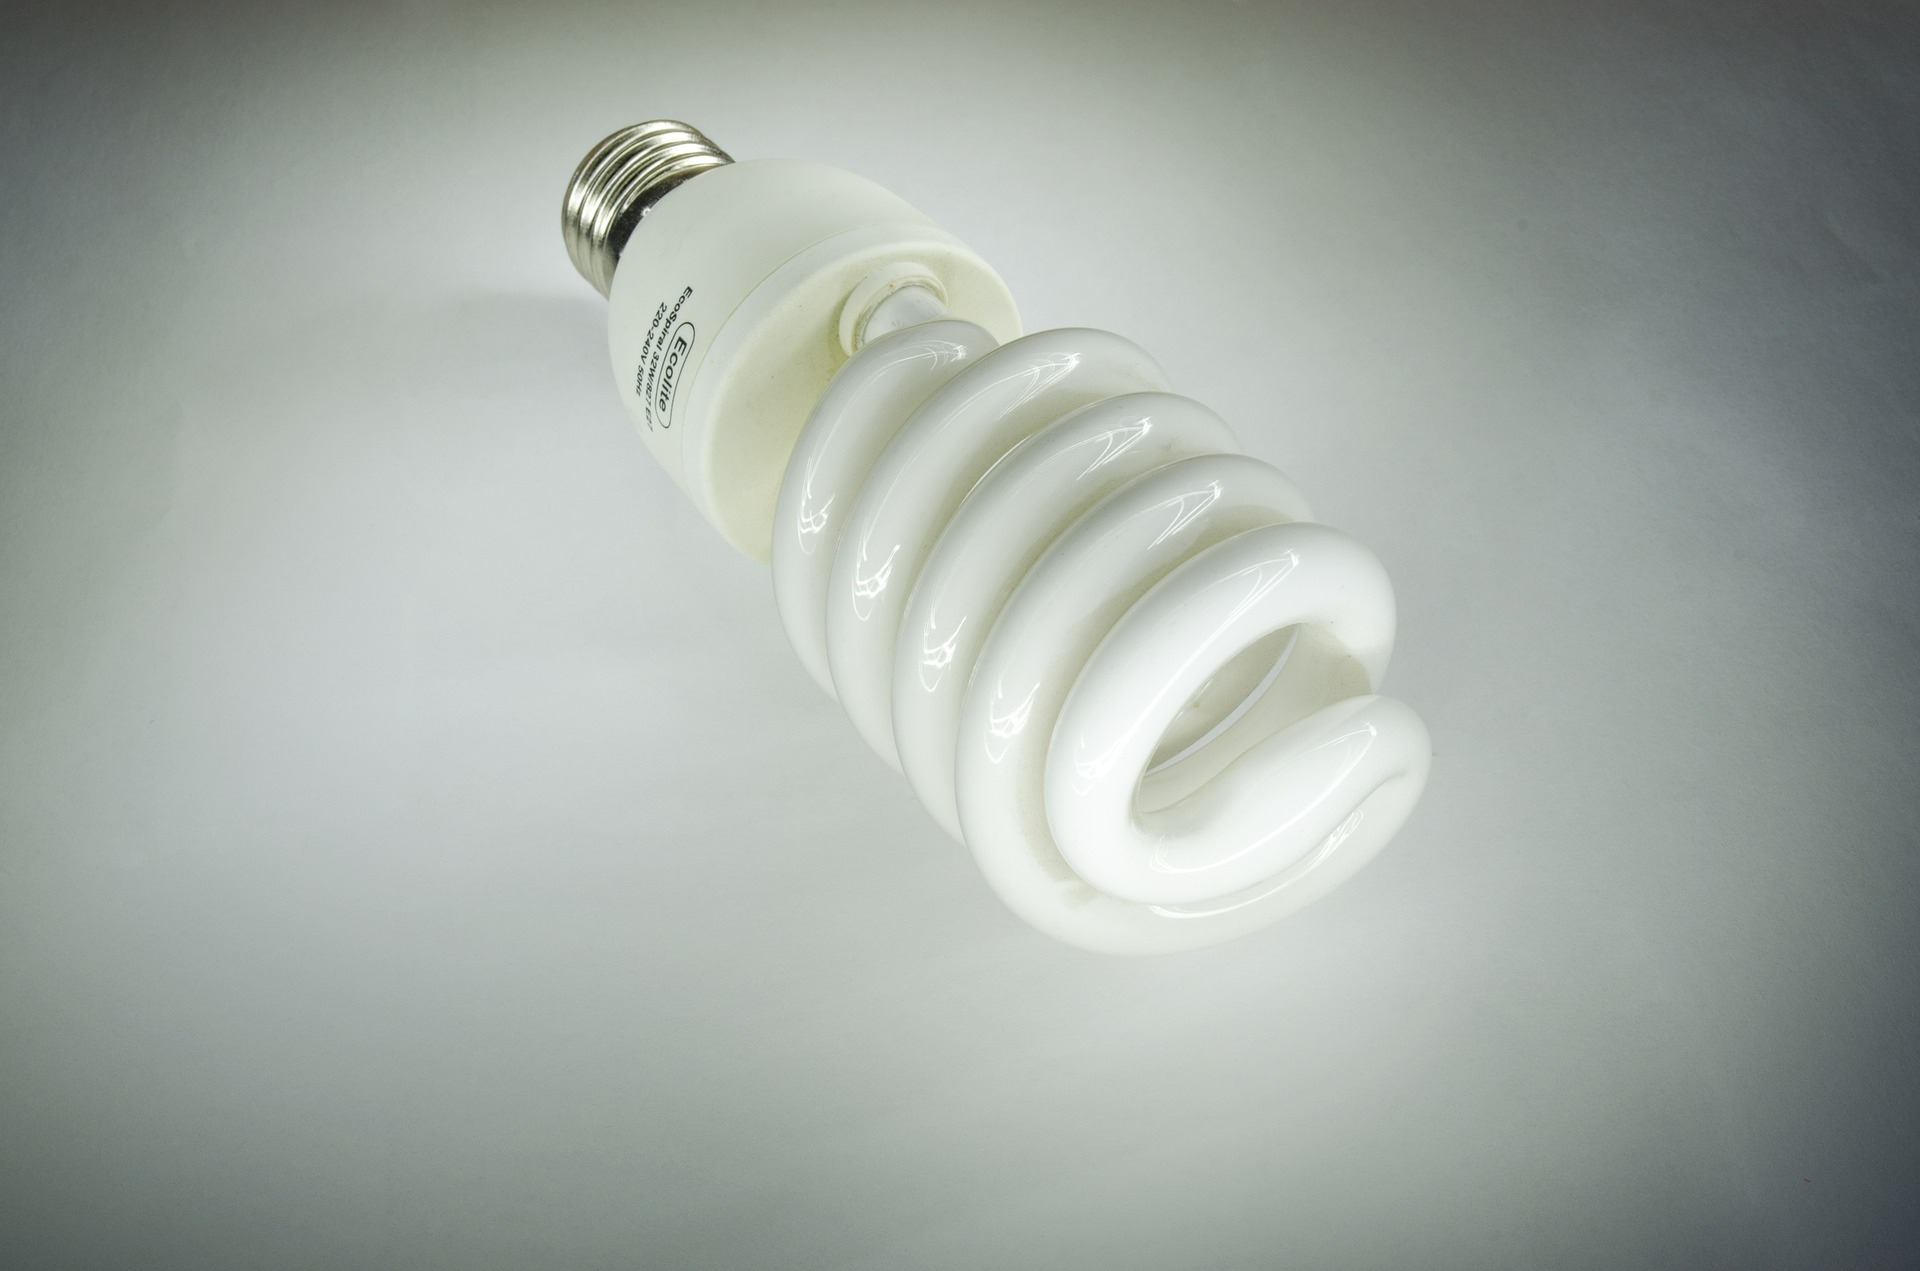 lampadina-risparmio-energetico-lamp-393176_1920